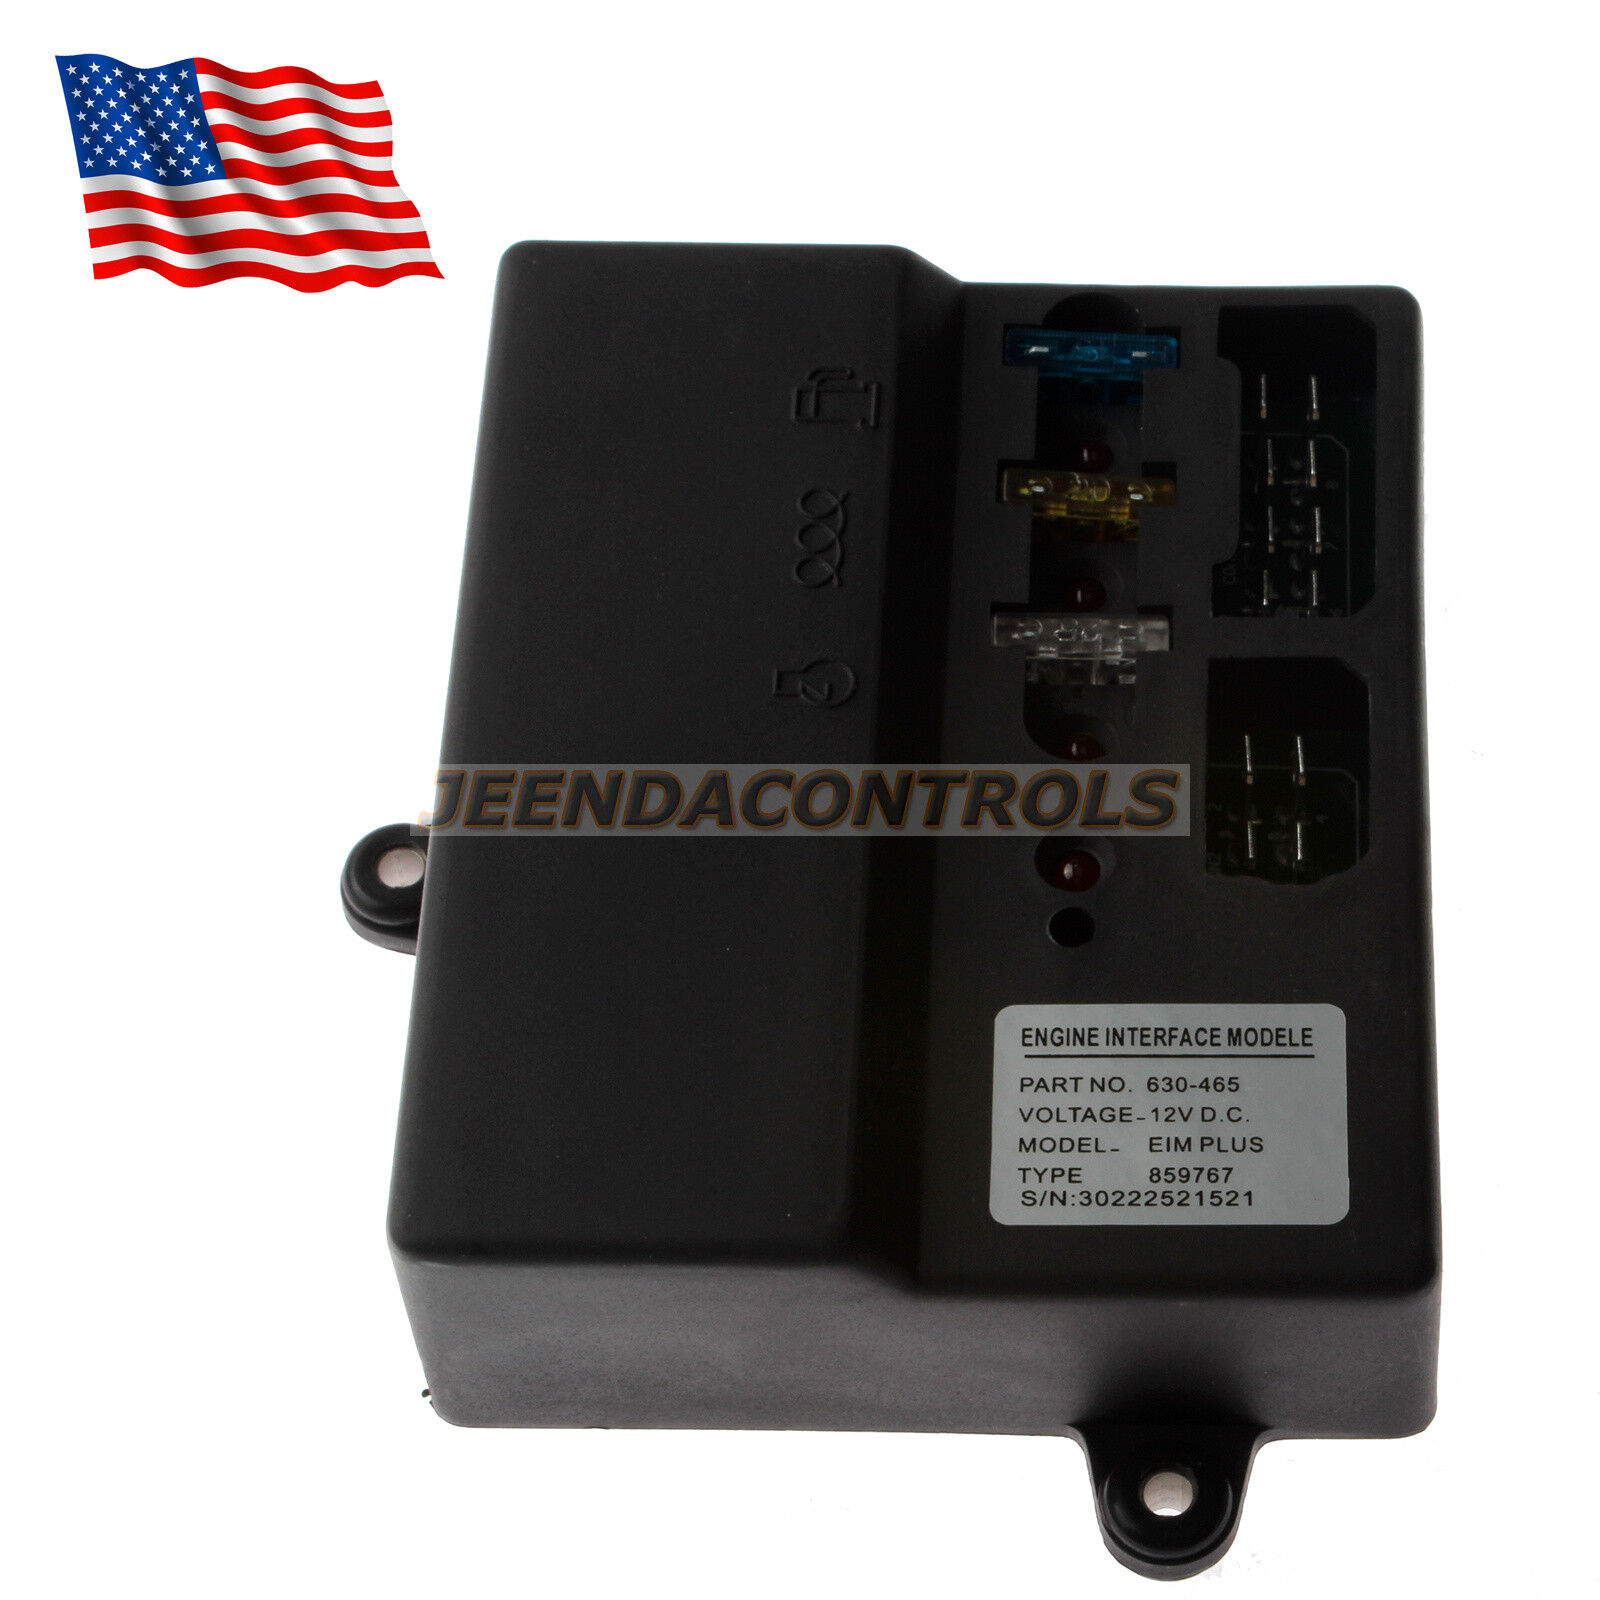 New Interface Module EIM 630-088 Replace EIM 630-465 FG Wilson Parts Engine 12V